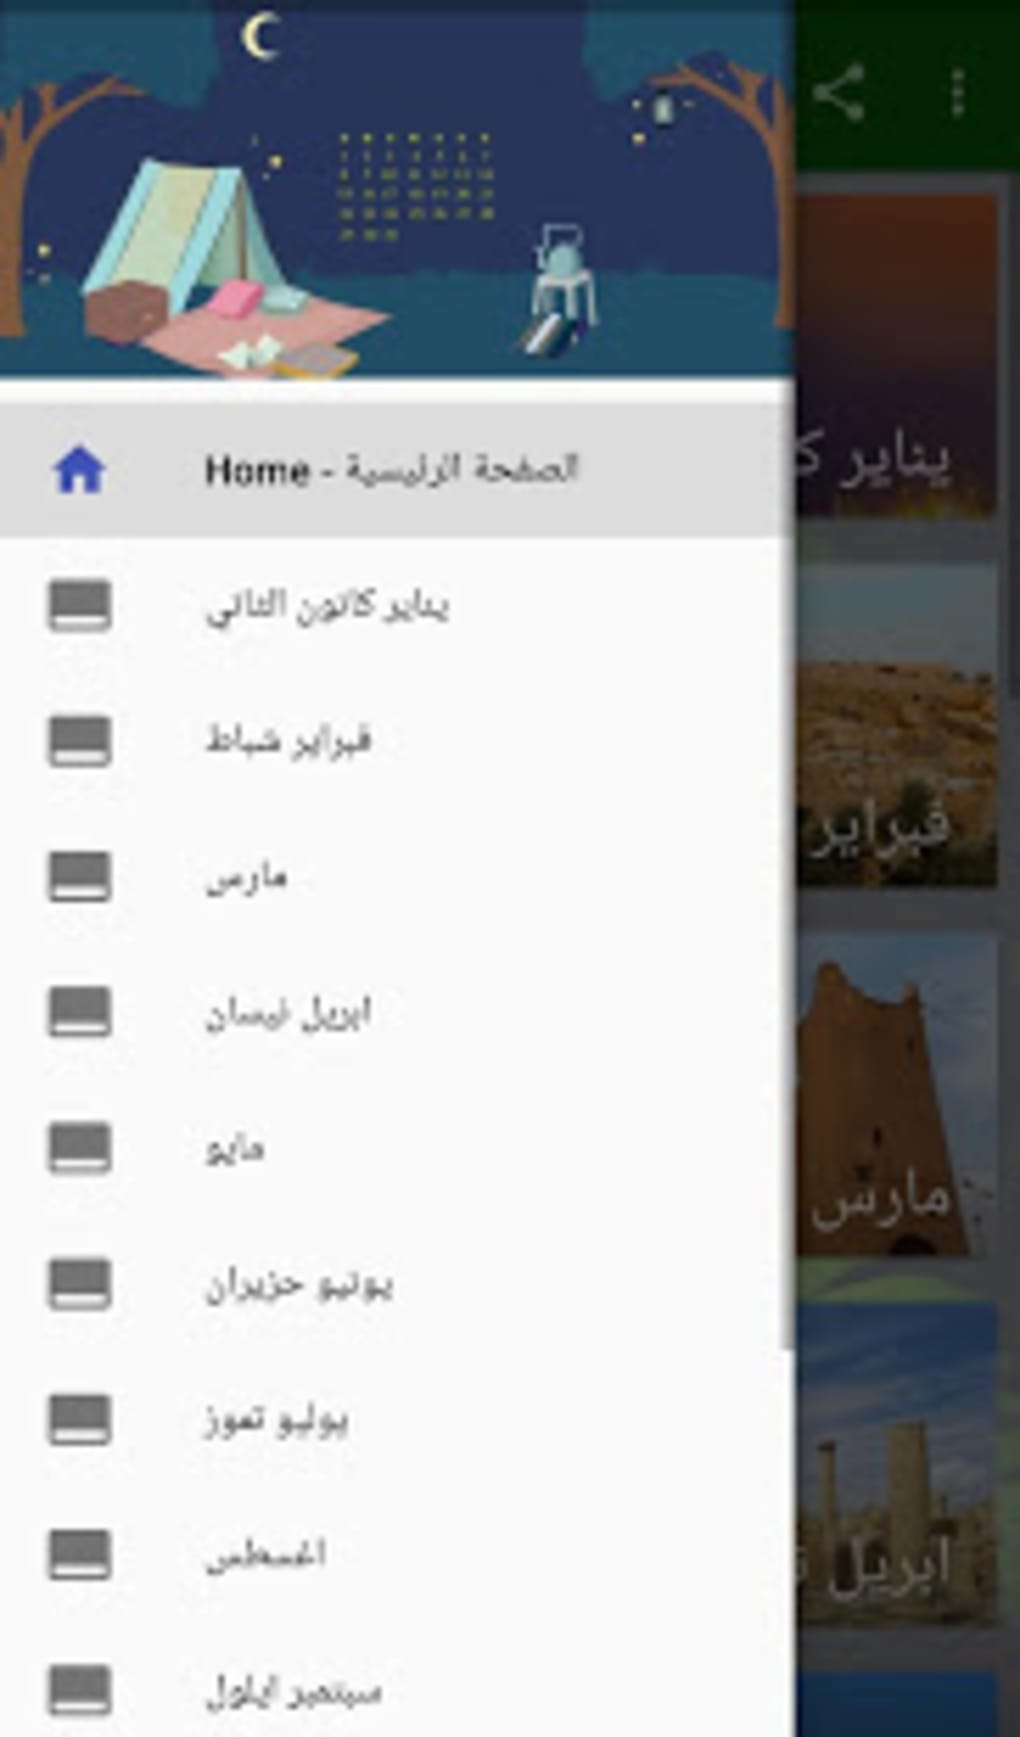 Algeria Calendar 2019 for Android - Download